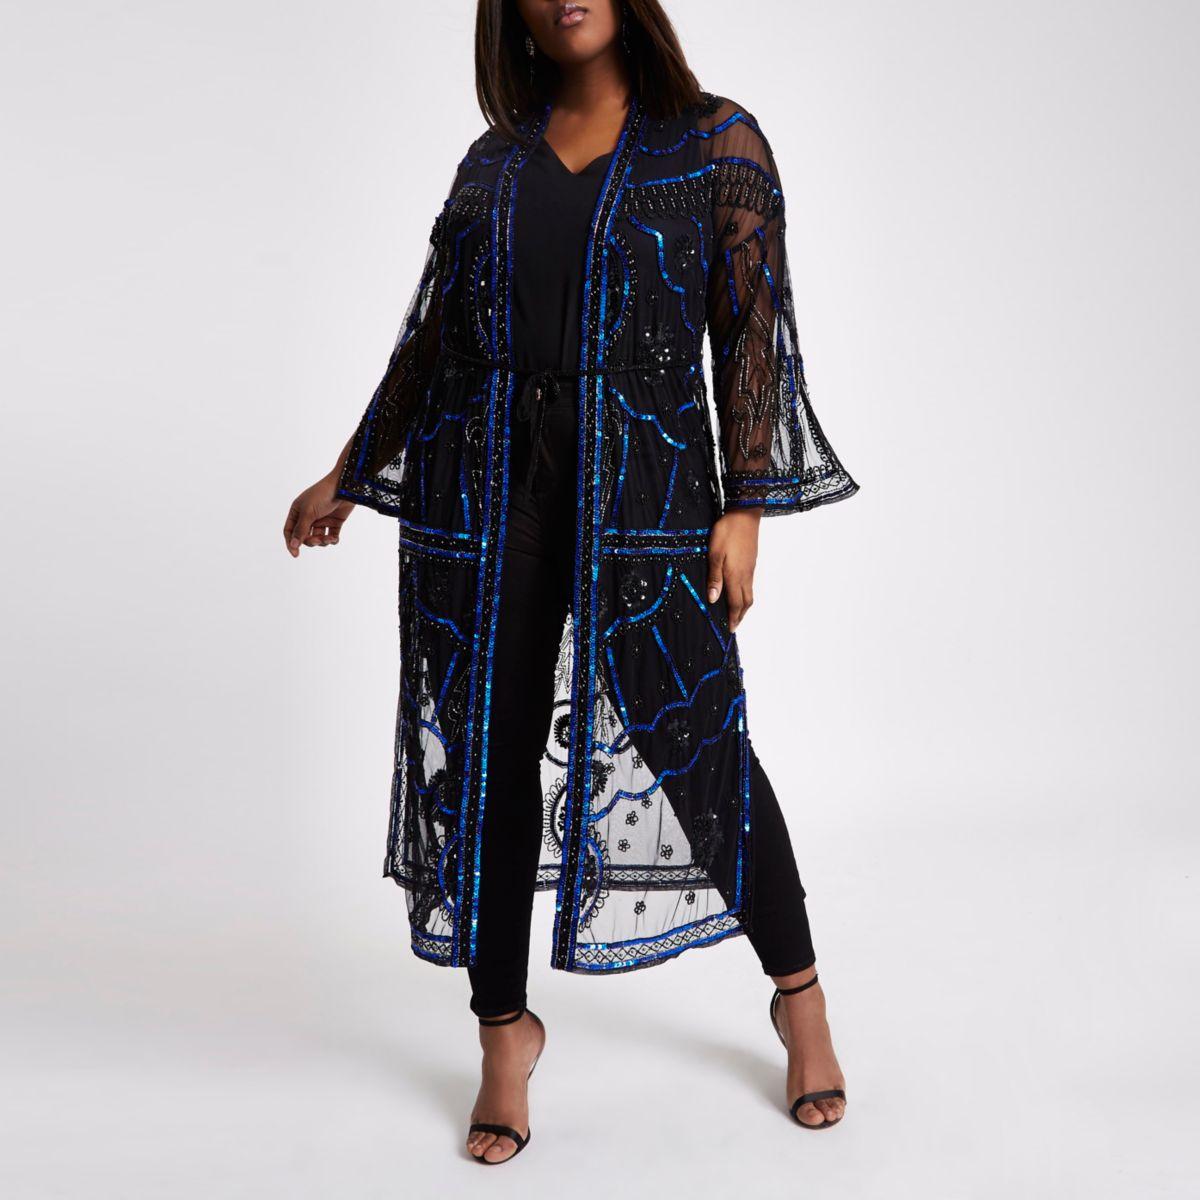 Plus Black Sequin Embellished Kimono by River Island